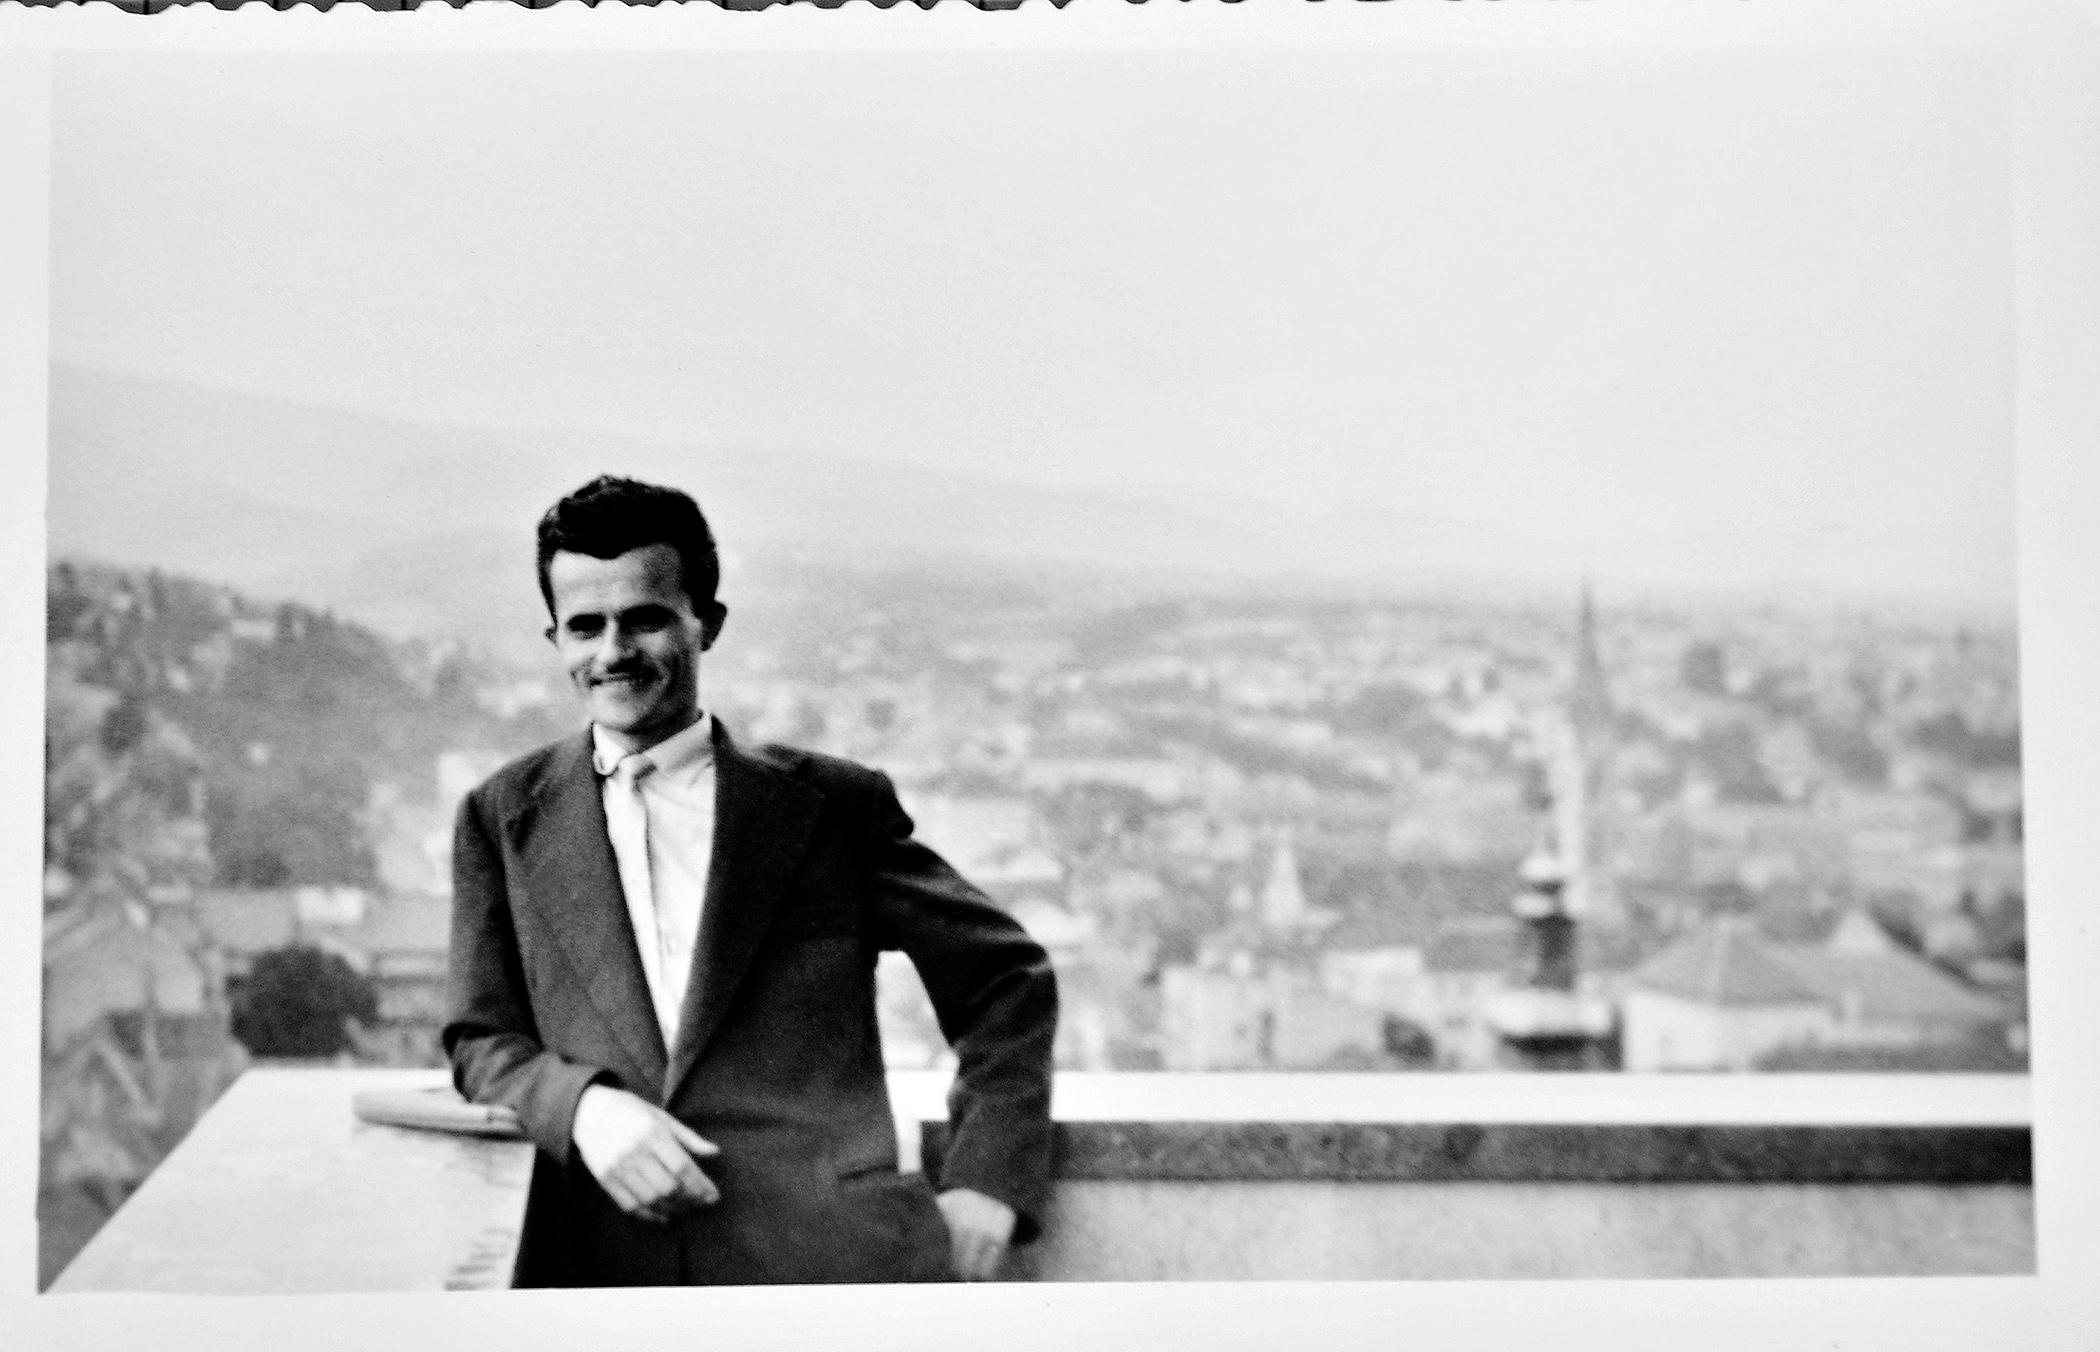 Zagreb, 160613. Andjelko Leko, predsjednik uprave HUP Zagreb, fotografiran u hotelu Sheraton. Na fotografiji: presnimka privatnog fotografskog albuma Andjelka Leke. Foto: Boris Kovacev / CROPIX